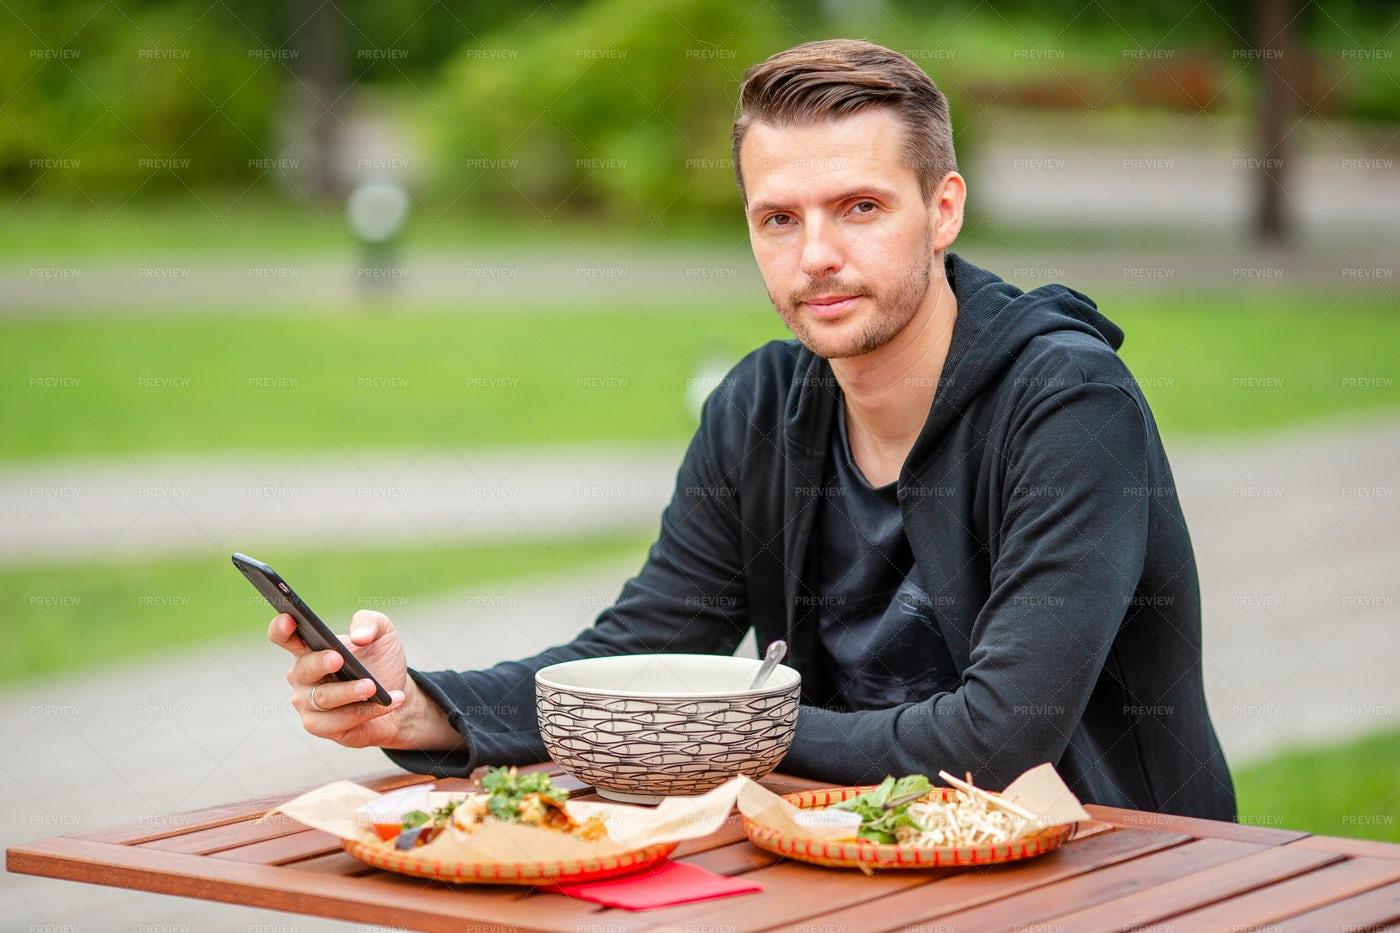 Man Eating Noodles: Stock Photos